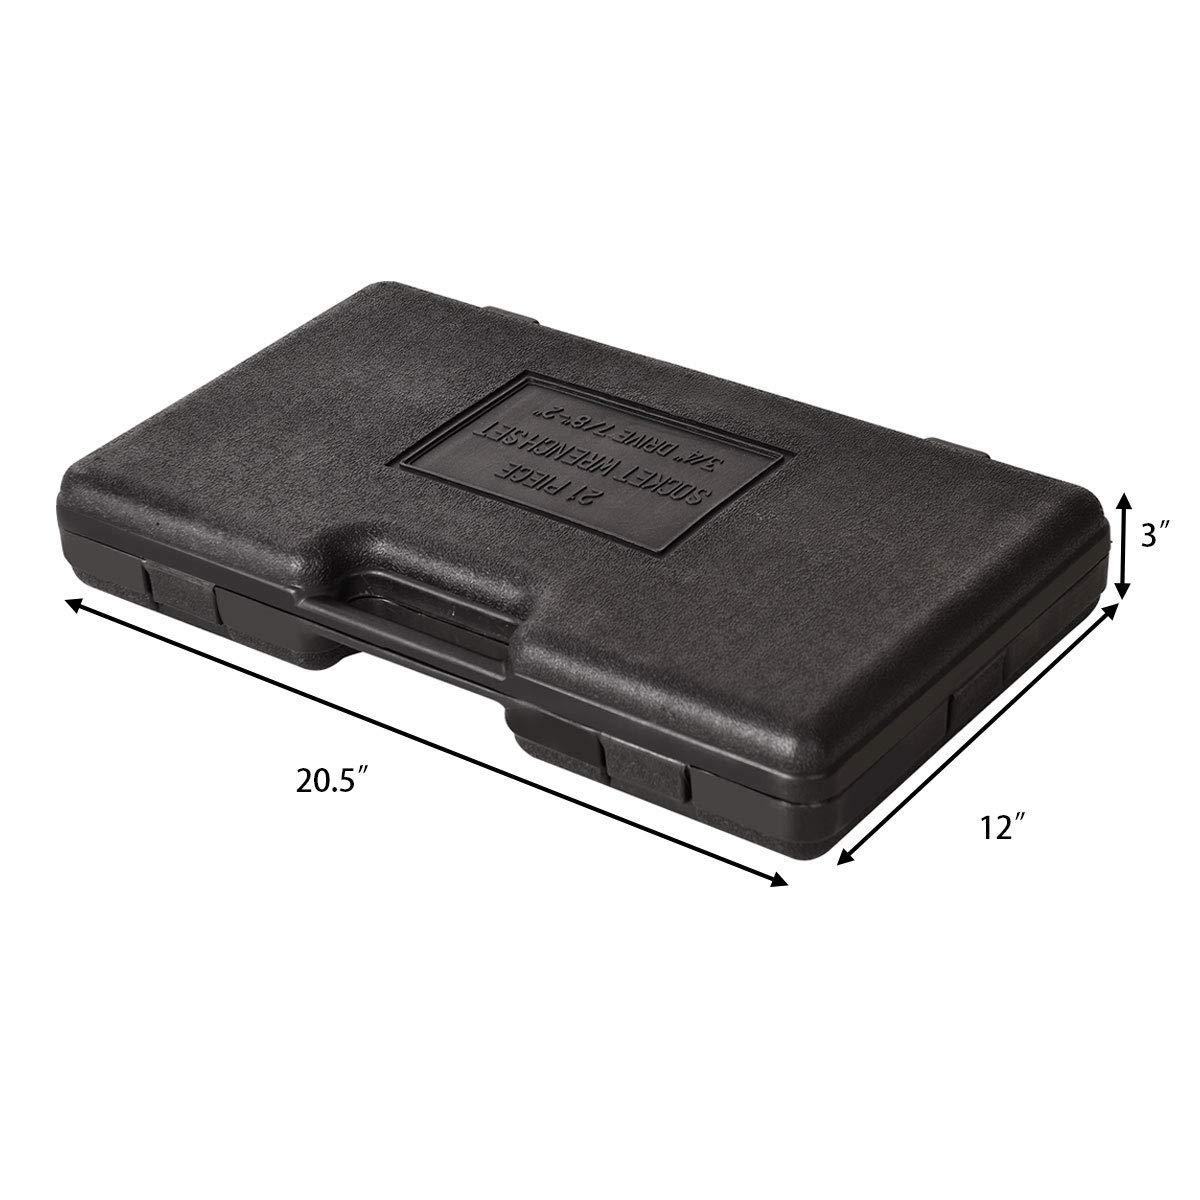 Goplus 21pcs SAE 3/4'' Drive Socket Set w/Case Jumbo Ratchet Wrench Extension (21pcs) by Goplus (Image #4)